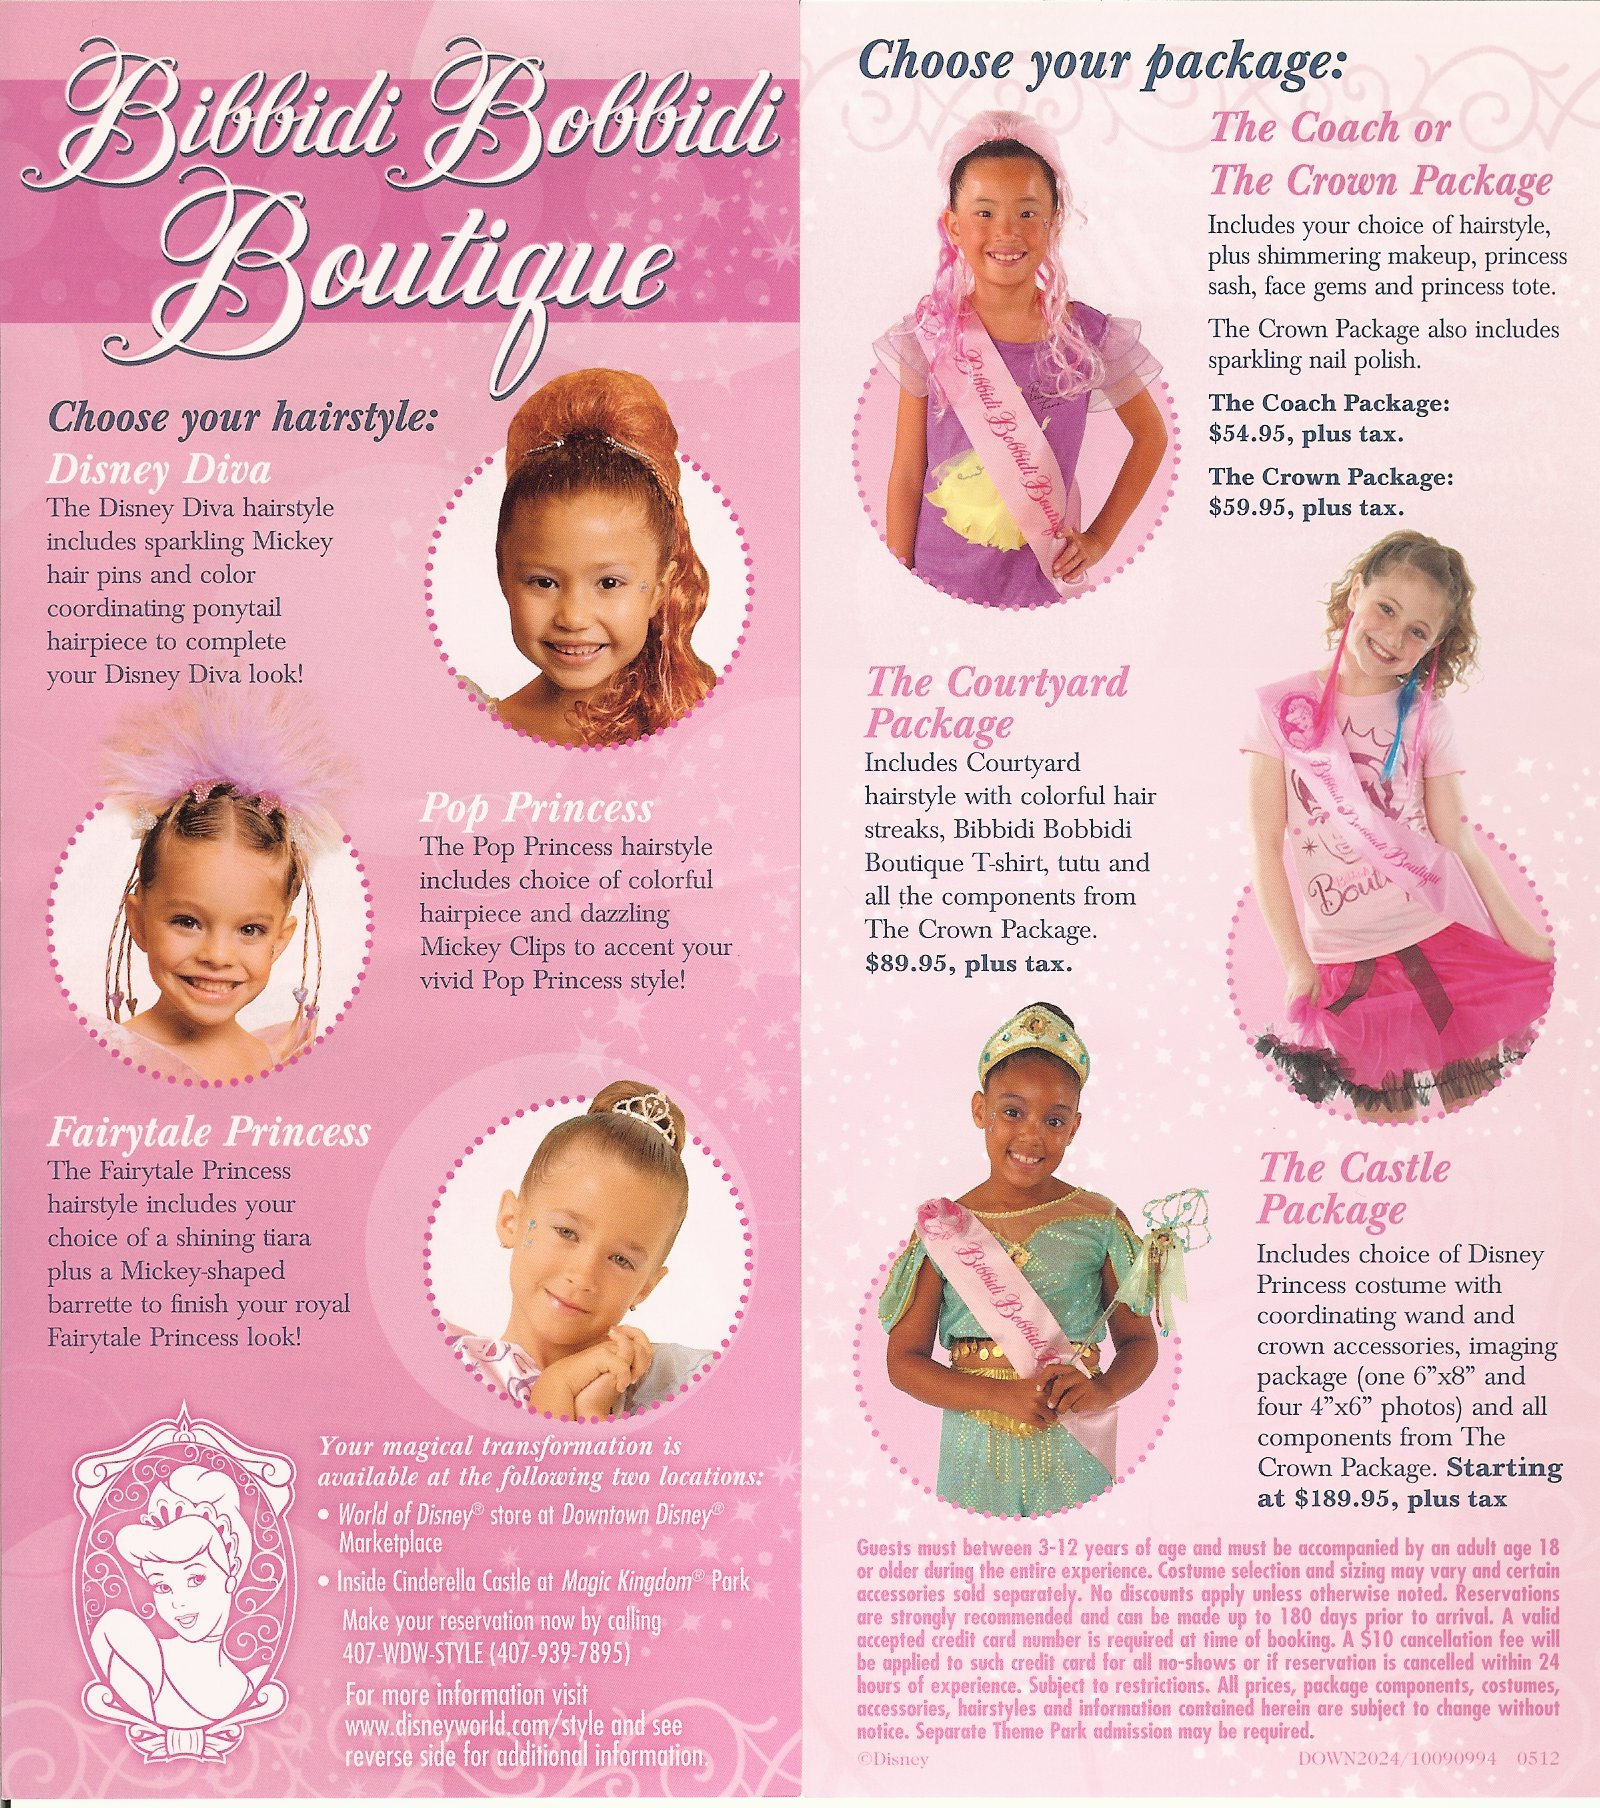 Magical Makeovers at the Bibbidi Bobbidi Boutique | Disneyways